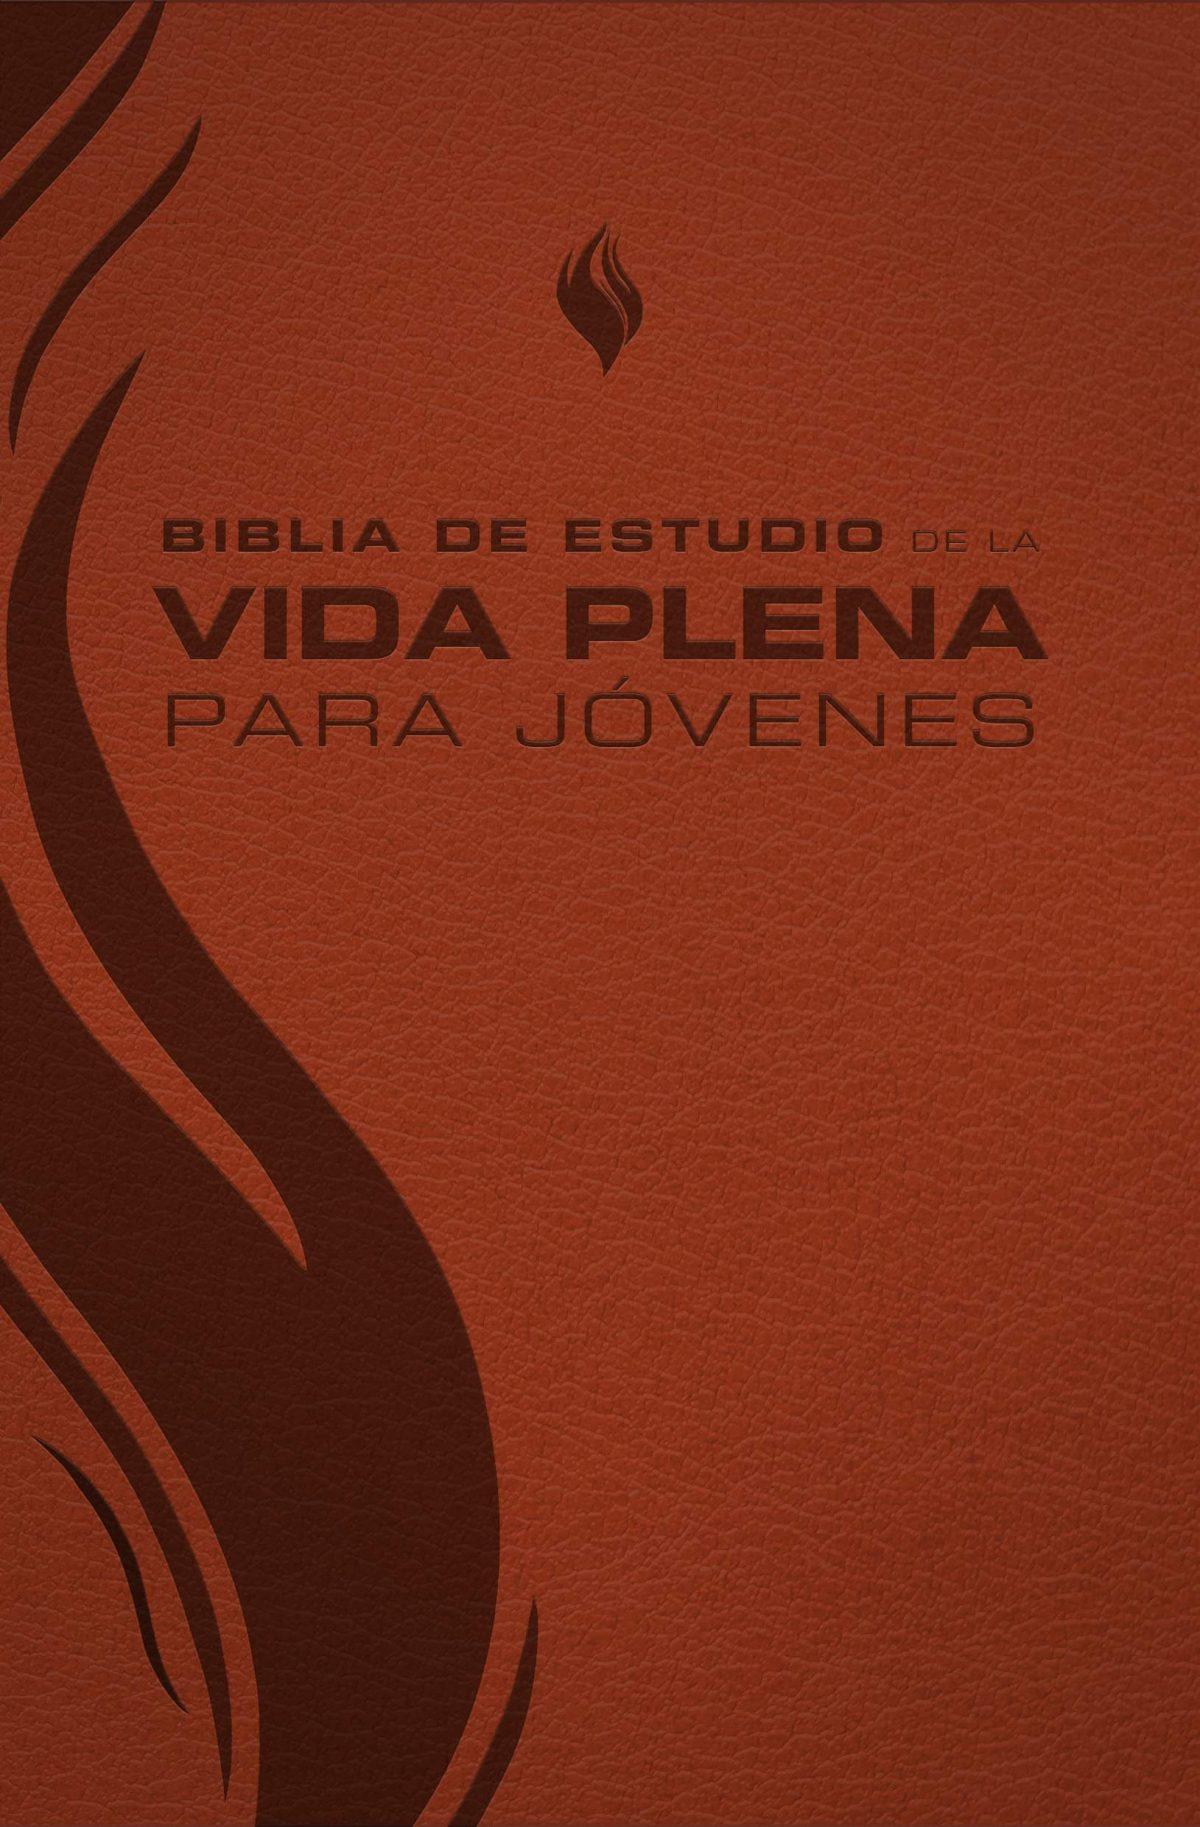 BIBLIA DE ESTUDIO DE LA  VIDA PLENA PARA JOVENES - MARRON